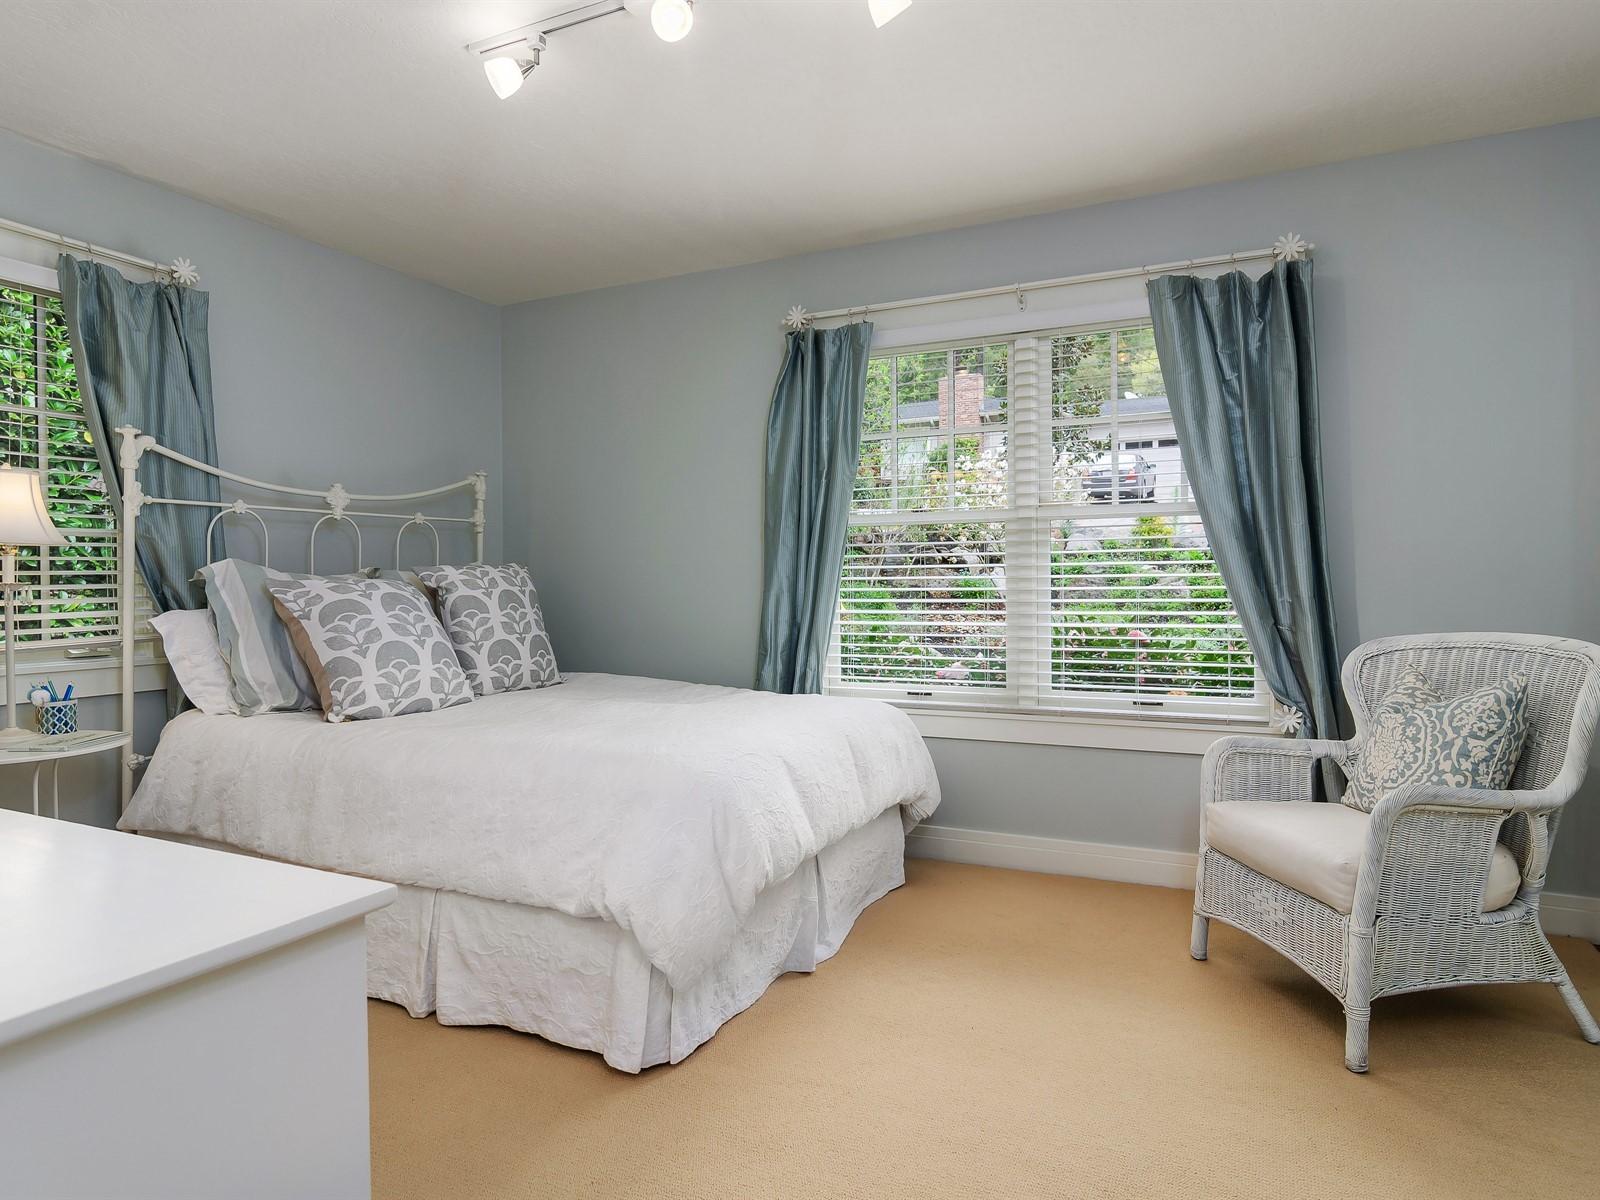 028_Bedroom.jpg